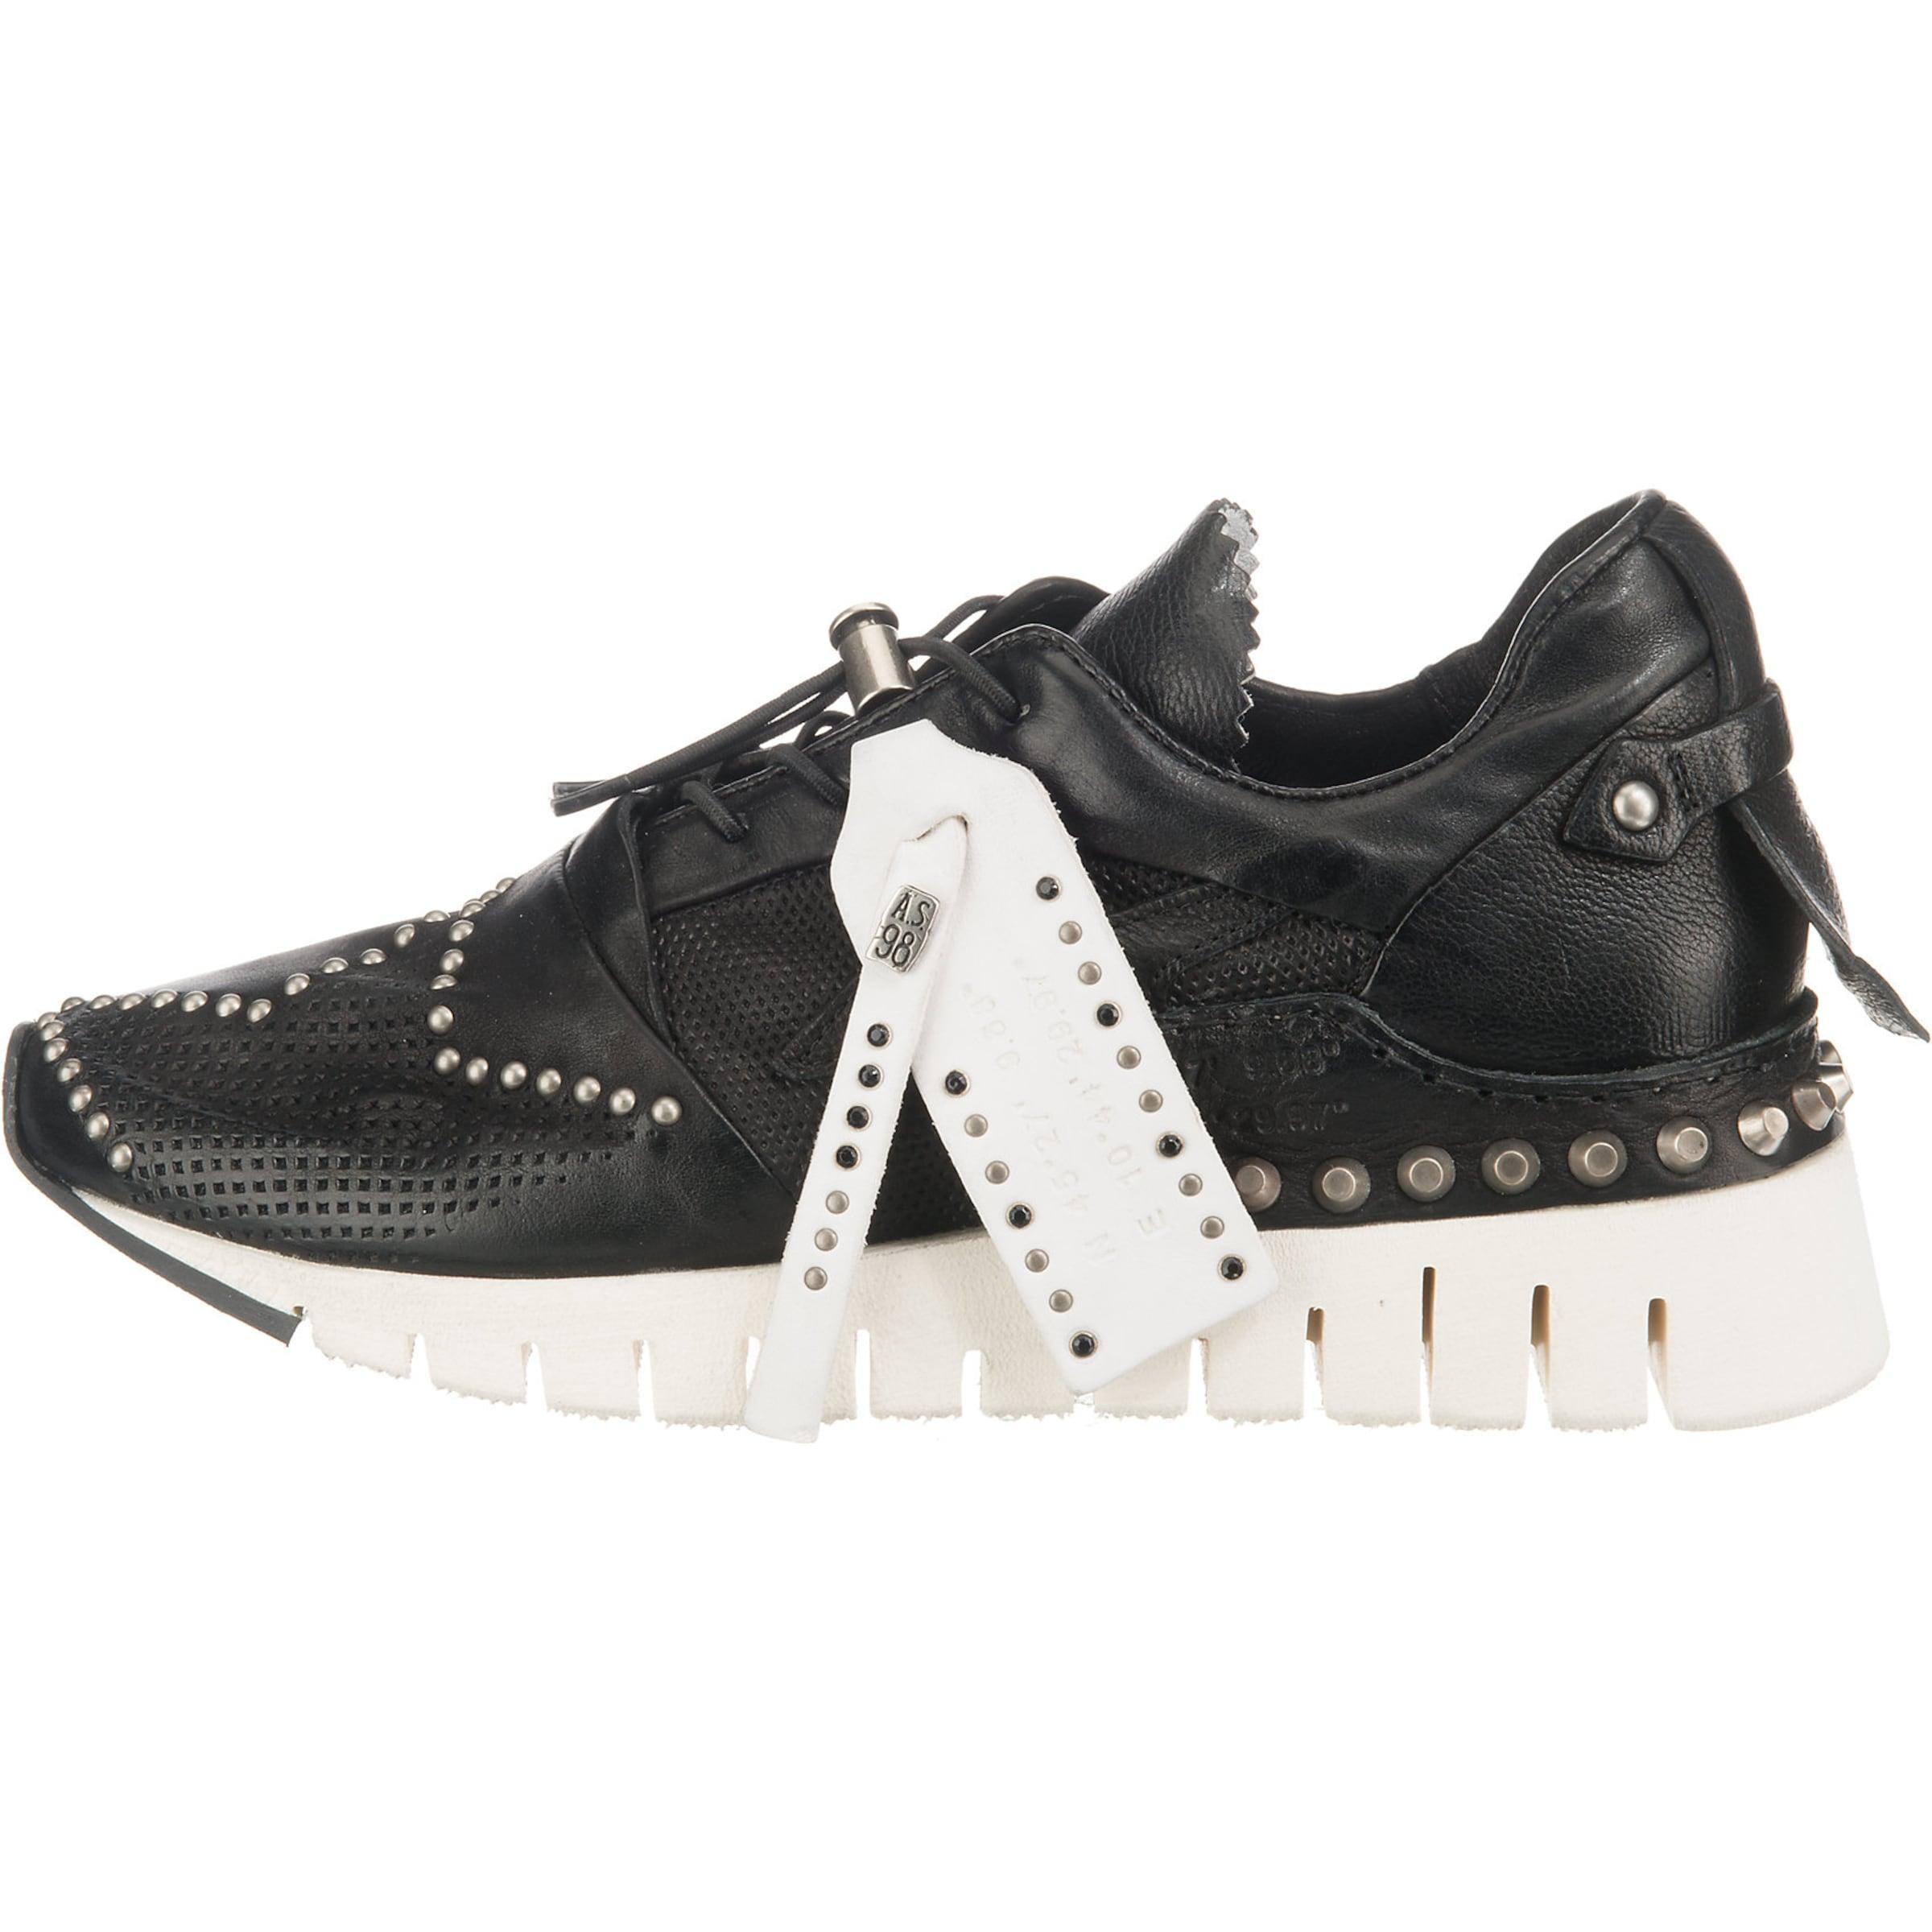 98 Sneakers s A In Schwarz NPOn0k8wX